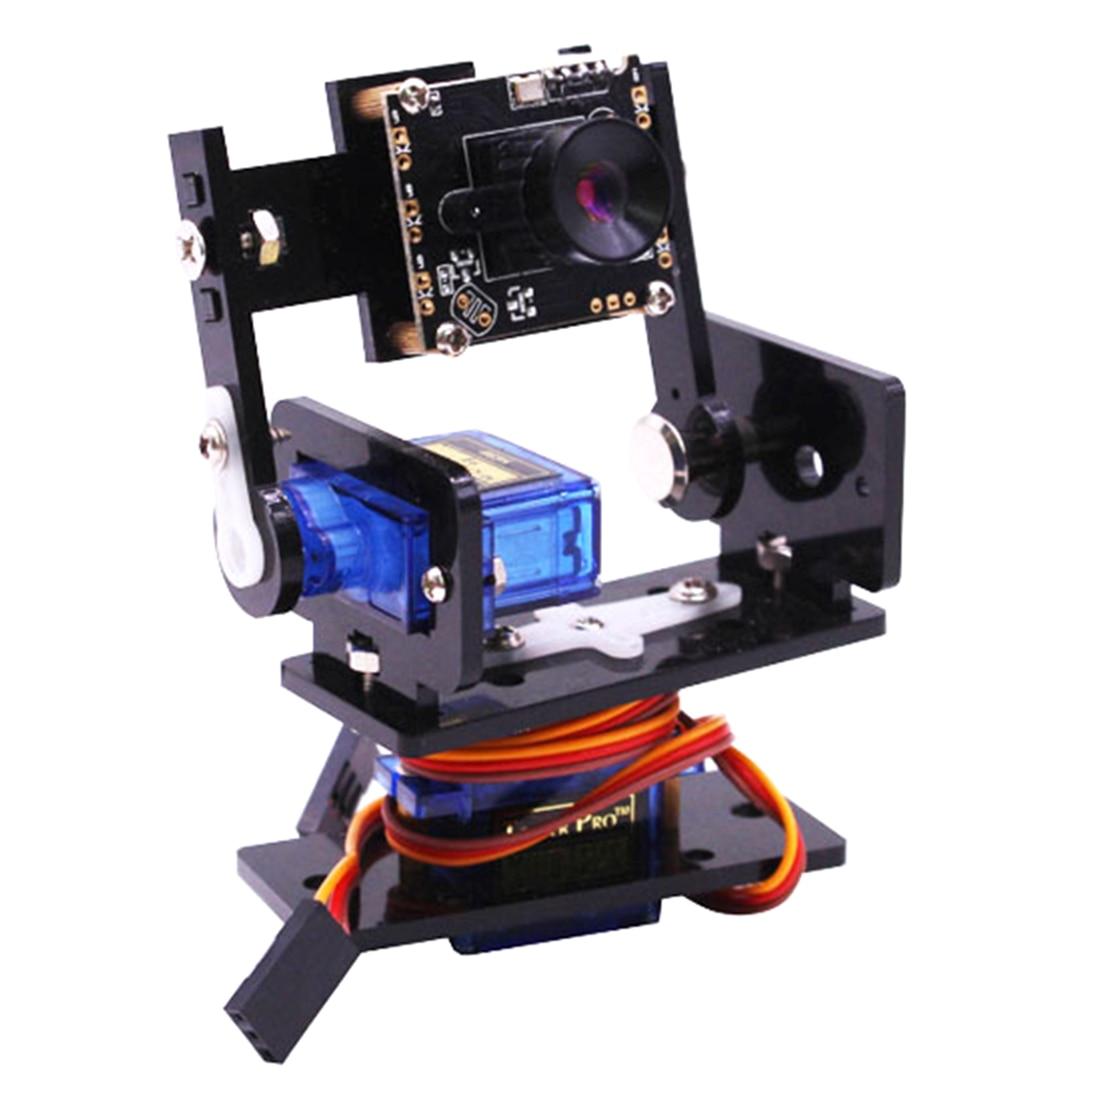 New Hot Camera Module Smart Vision Sensor Pan-Tilt Kit With 2 Pcs Micro Servos Smart Robot HD Camera For Raspberry Pi